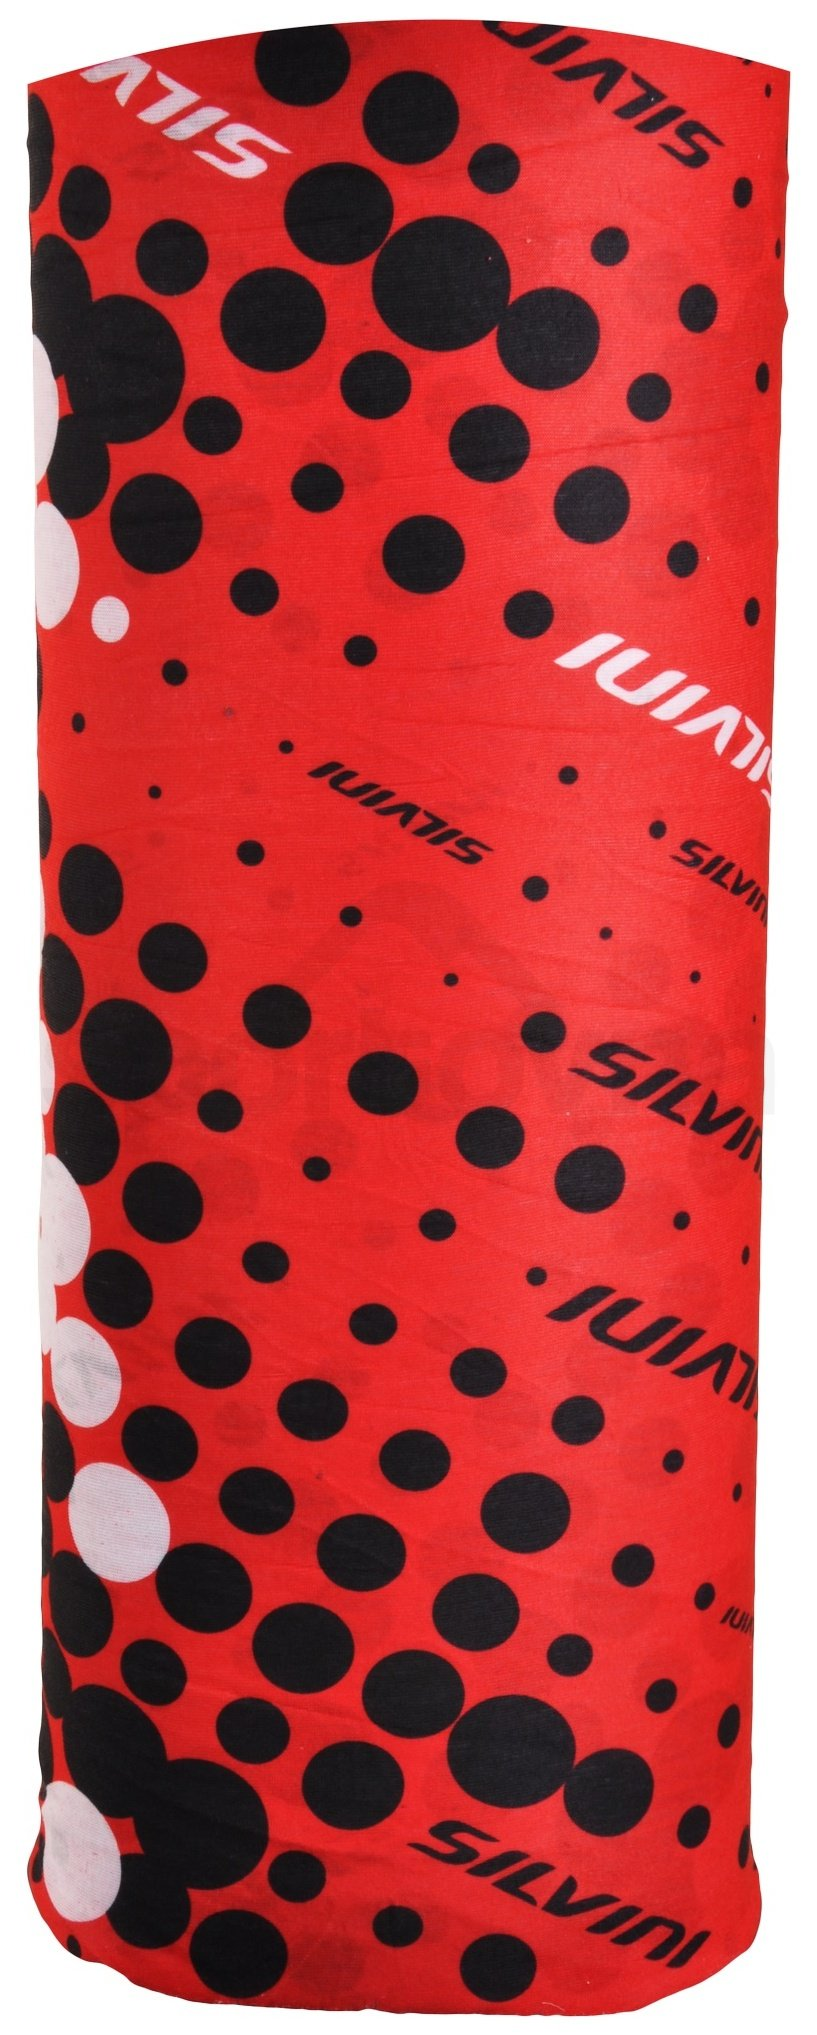 15723_nakrcnik-silvini-motivo-ua508-black-red